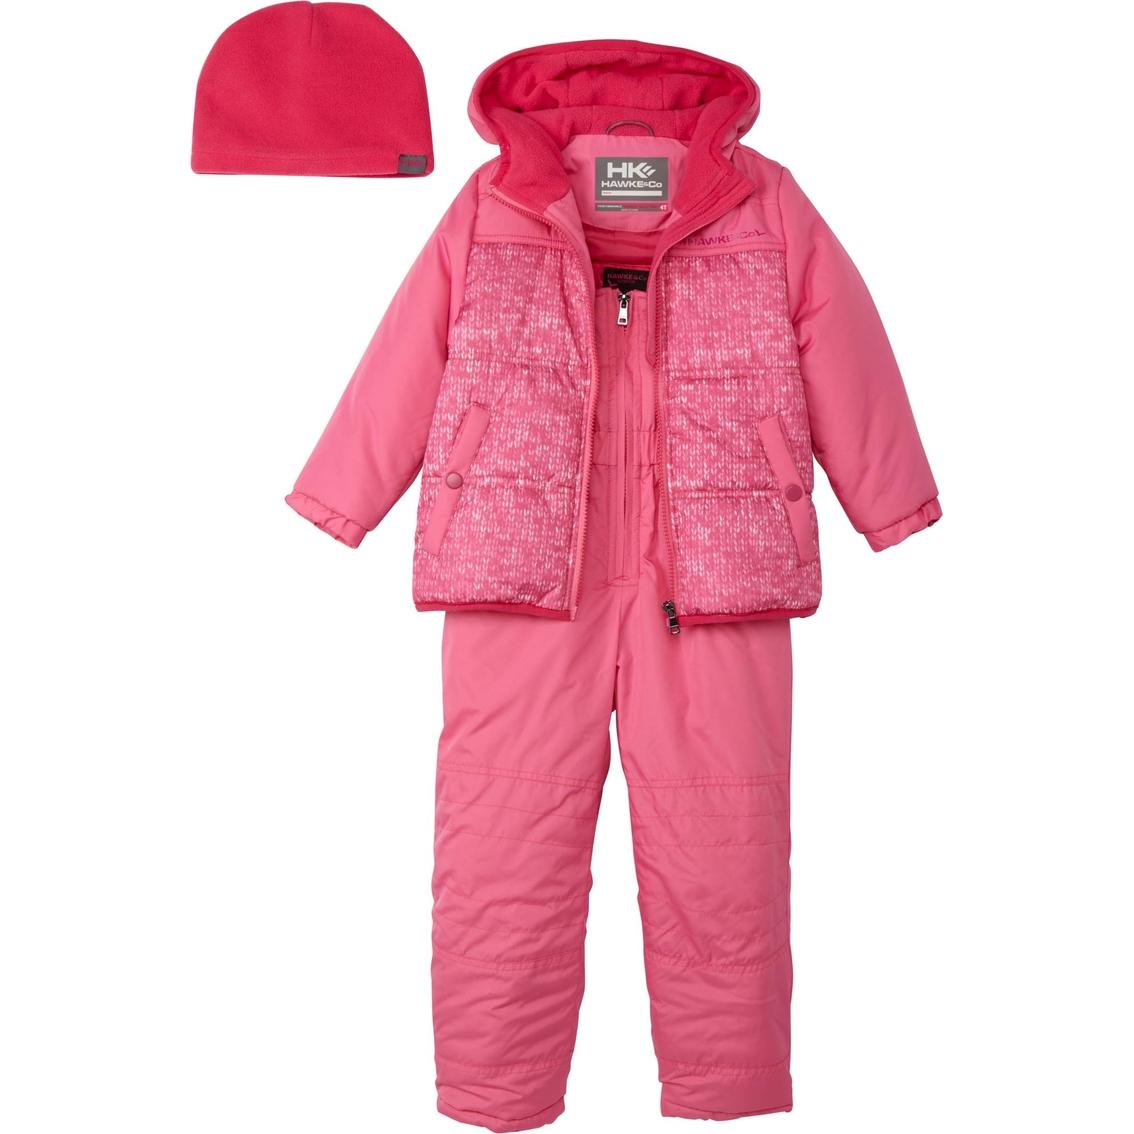 07c07b41a Hawke Toddler Girls Snowsuit